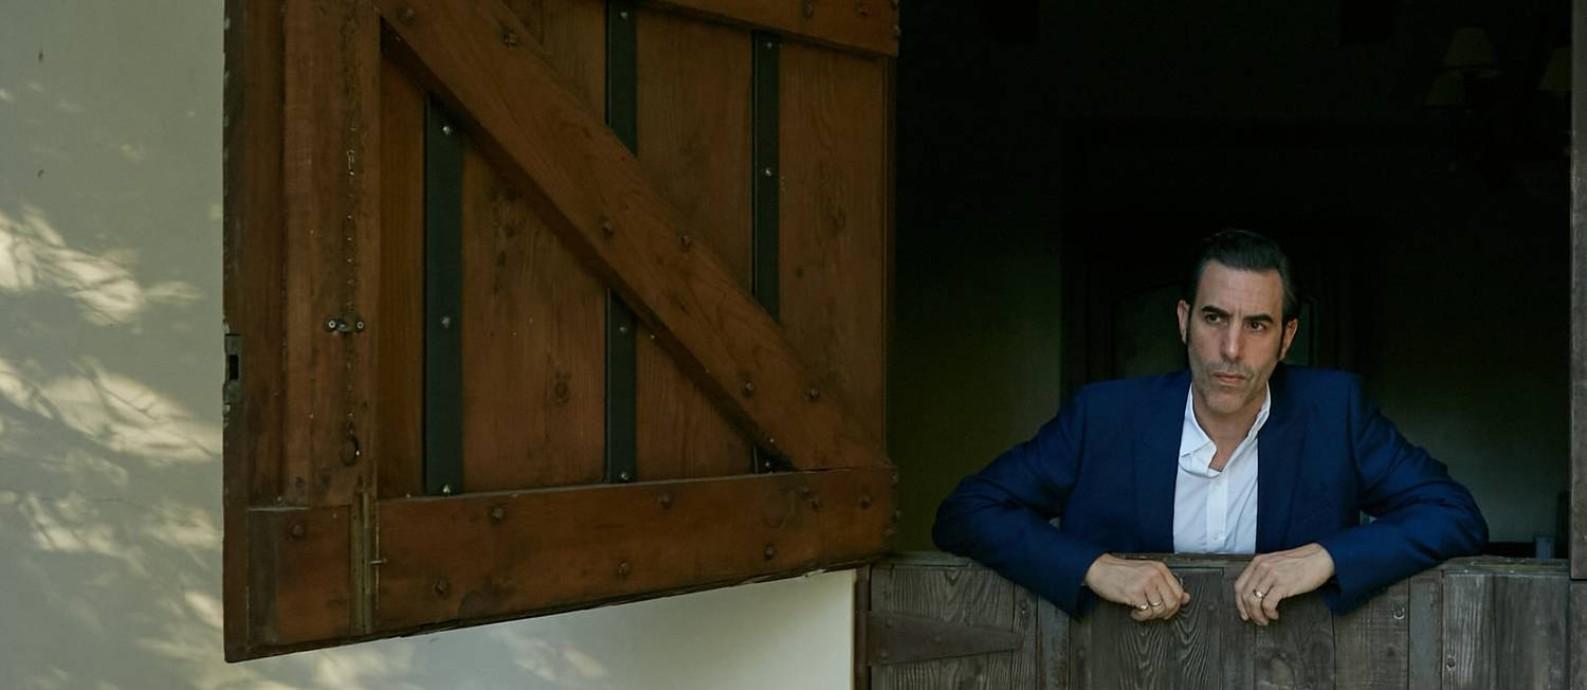 O ator Sacha Baron Cohen Foto: BUCK ELLISON / NYT